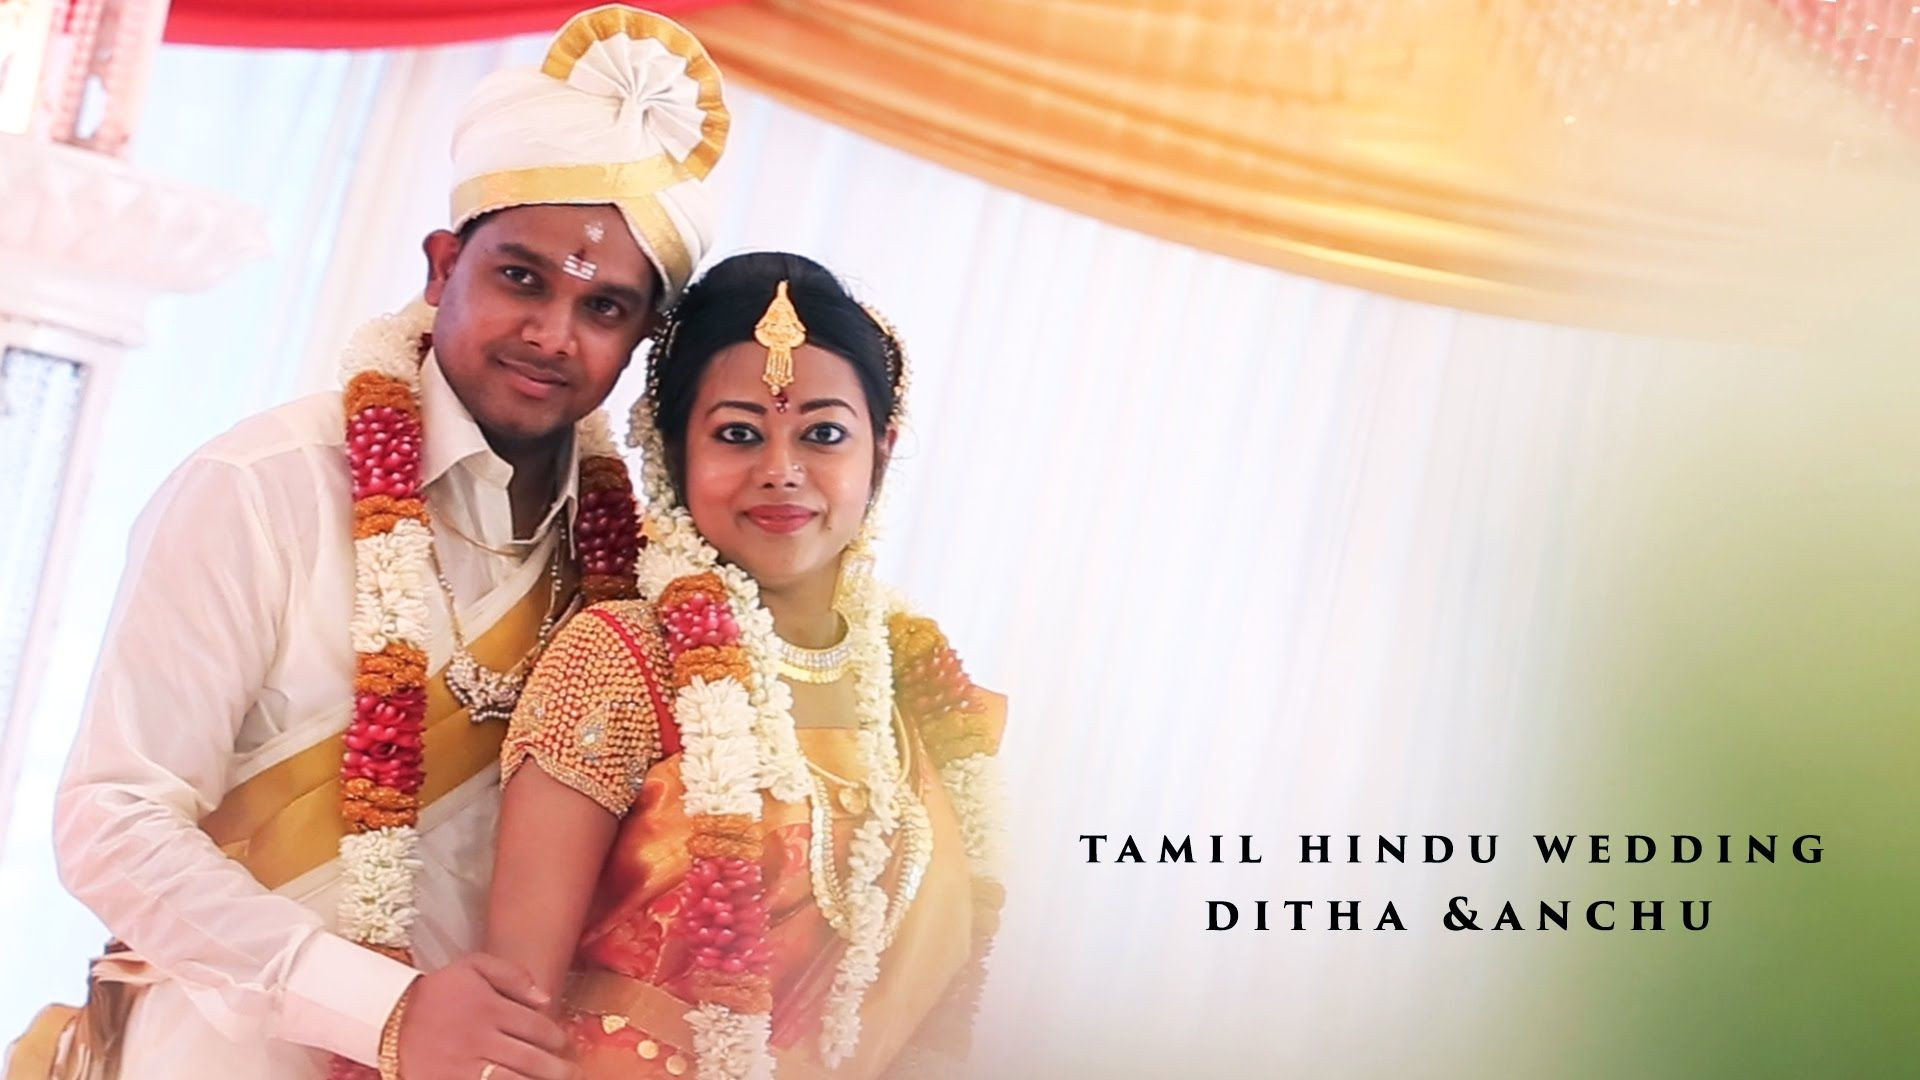 Indian Tri color background | Tamil Wedding | Pinterest | Tamil ...